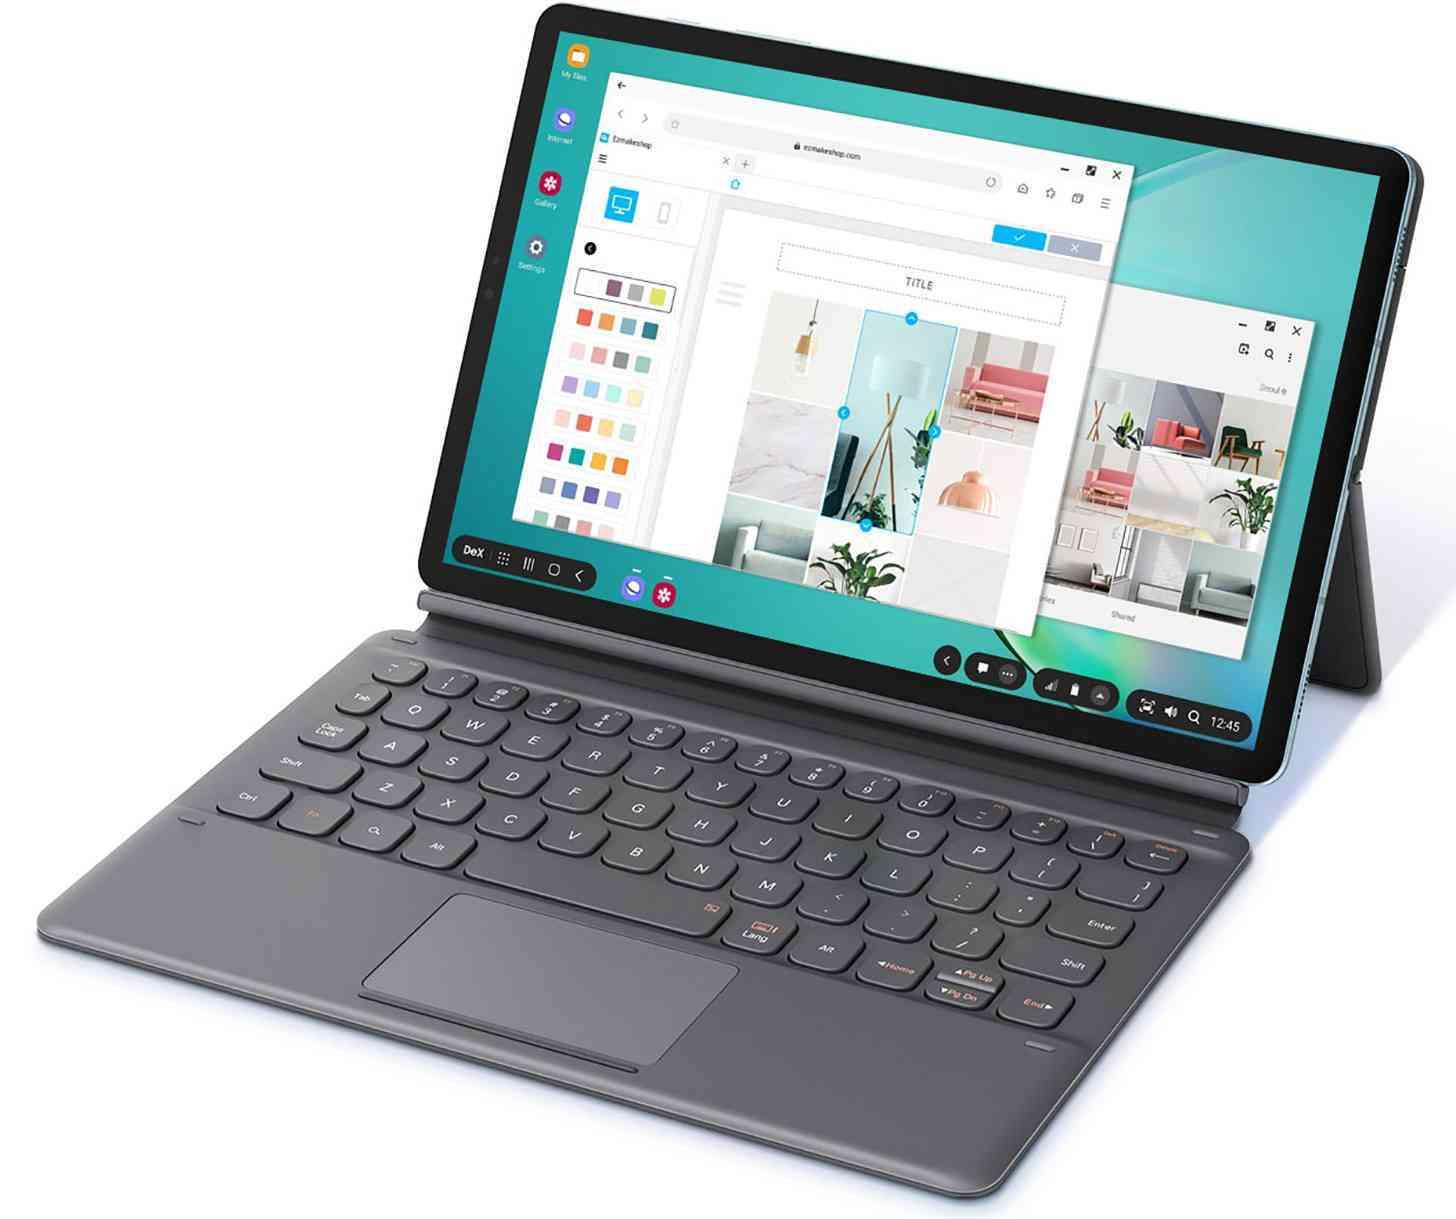 Samsung Galaxy Tab S6 with a keyboard